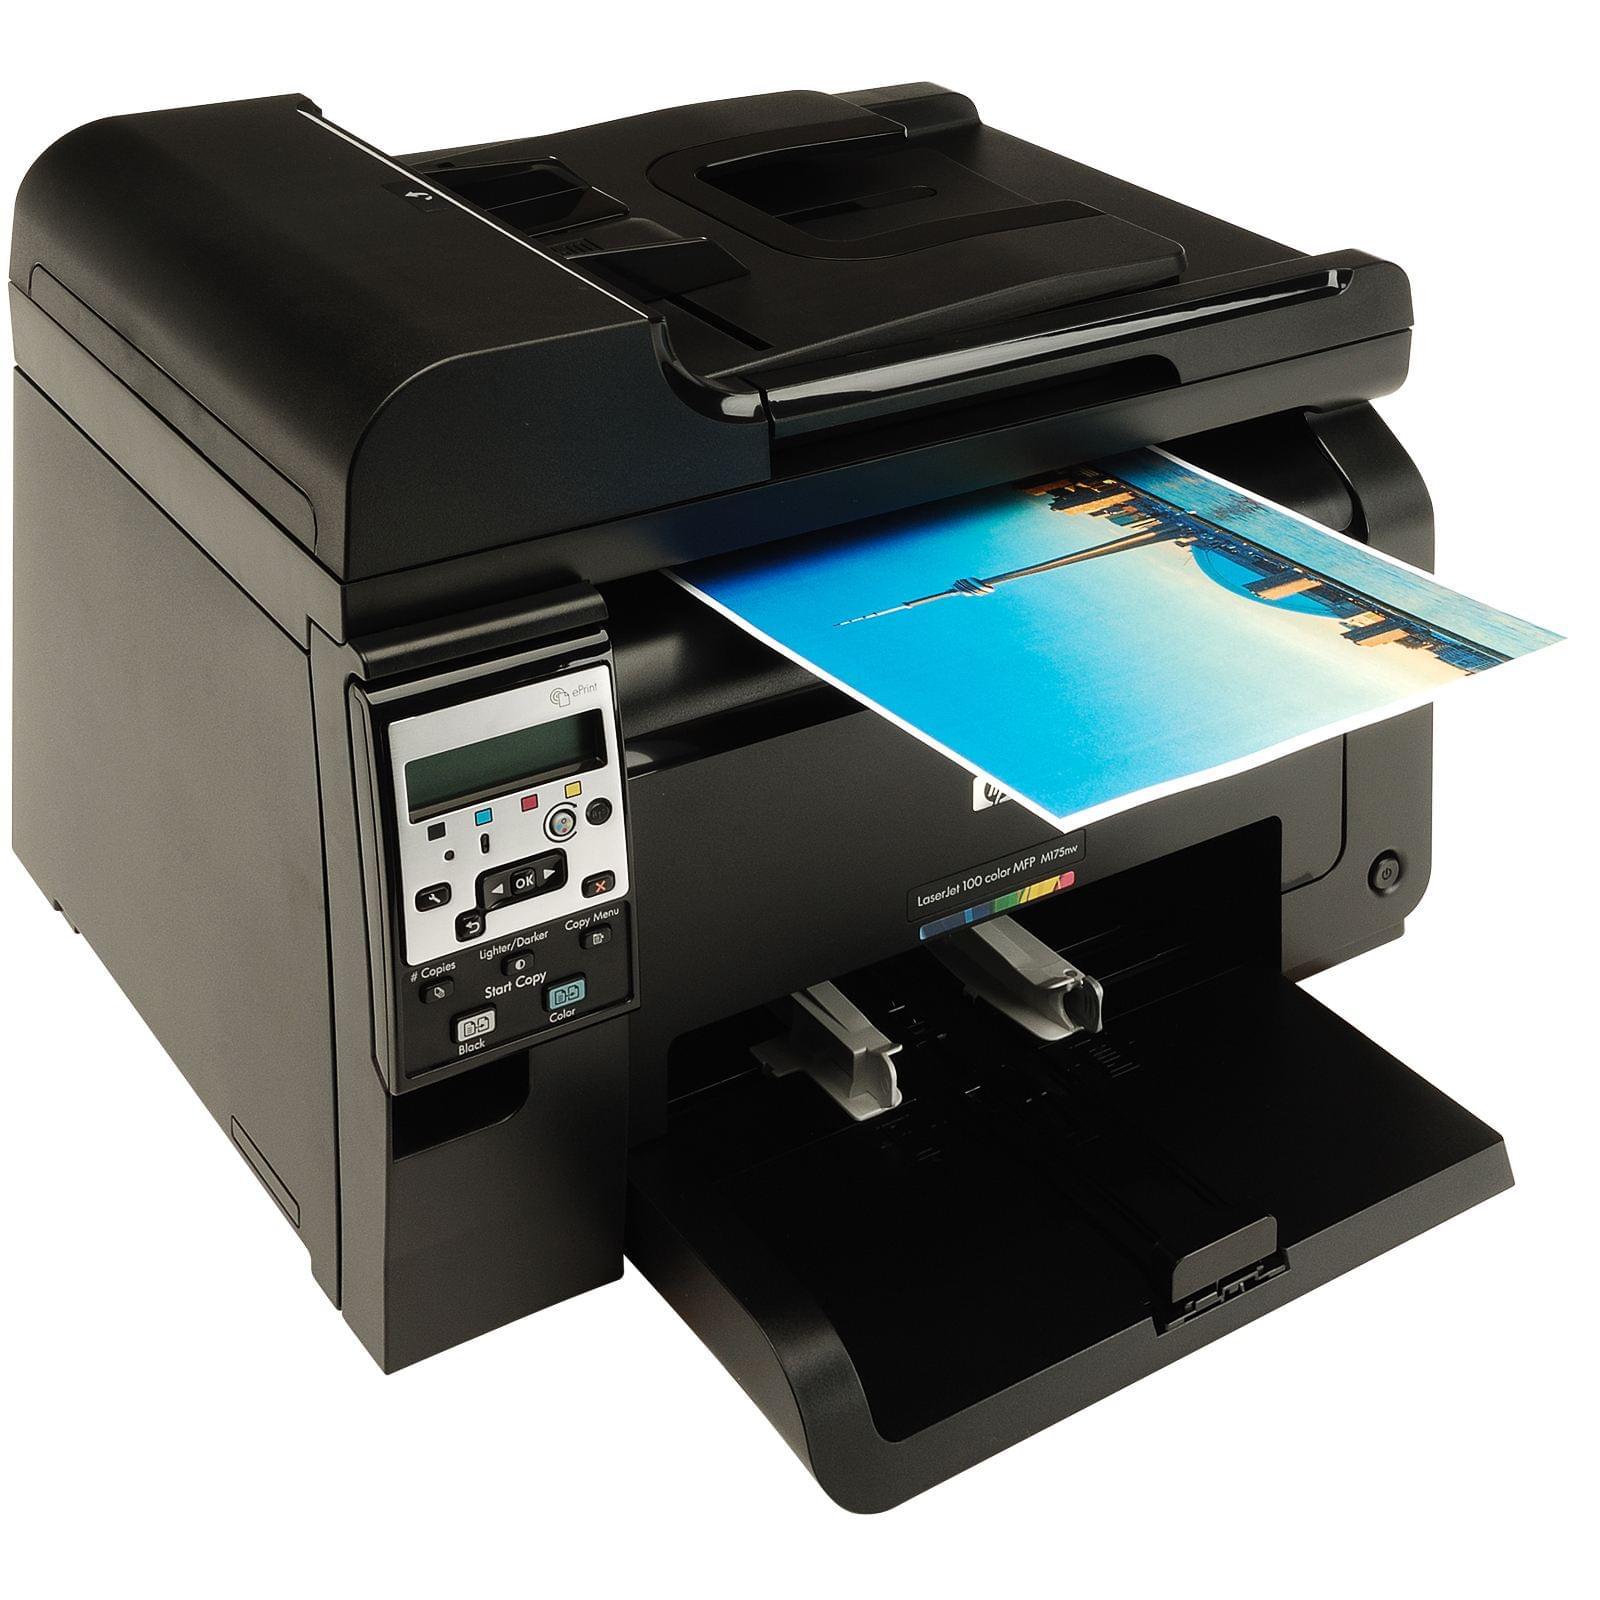 Imprimante multifonction HP LaserJet Pro 100 Color MFP M175nw - 0